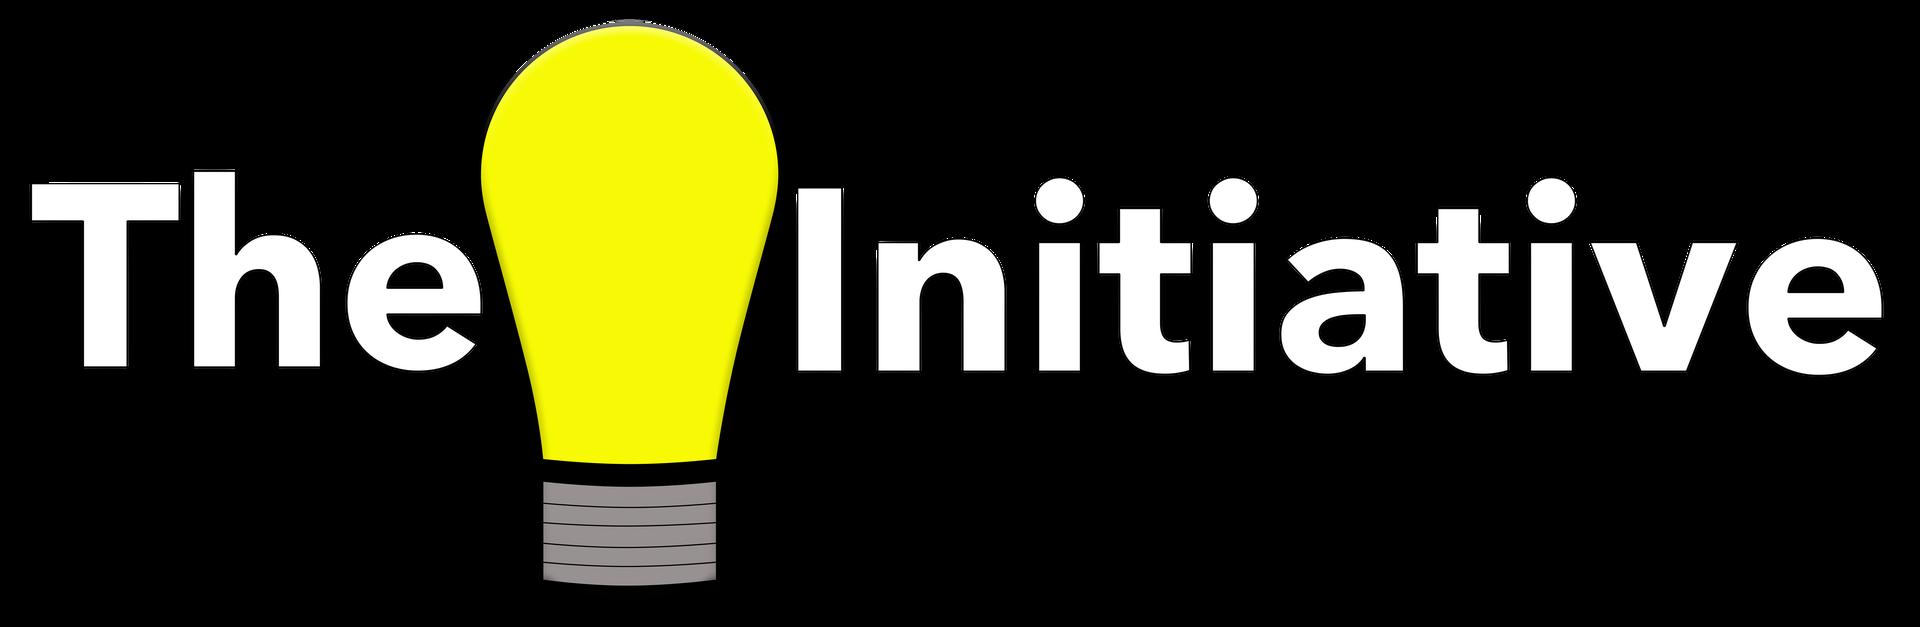 THE LIGHTBULB INITIATIVE logo